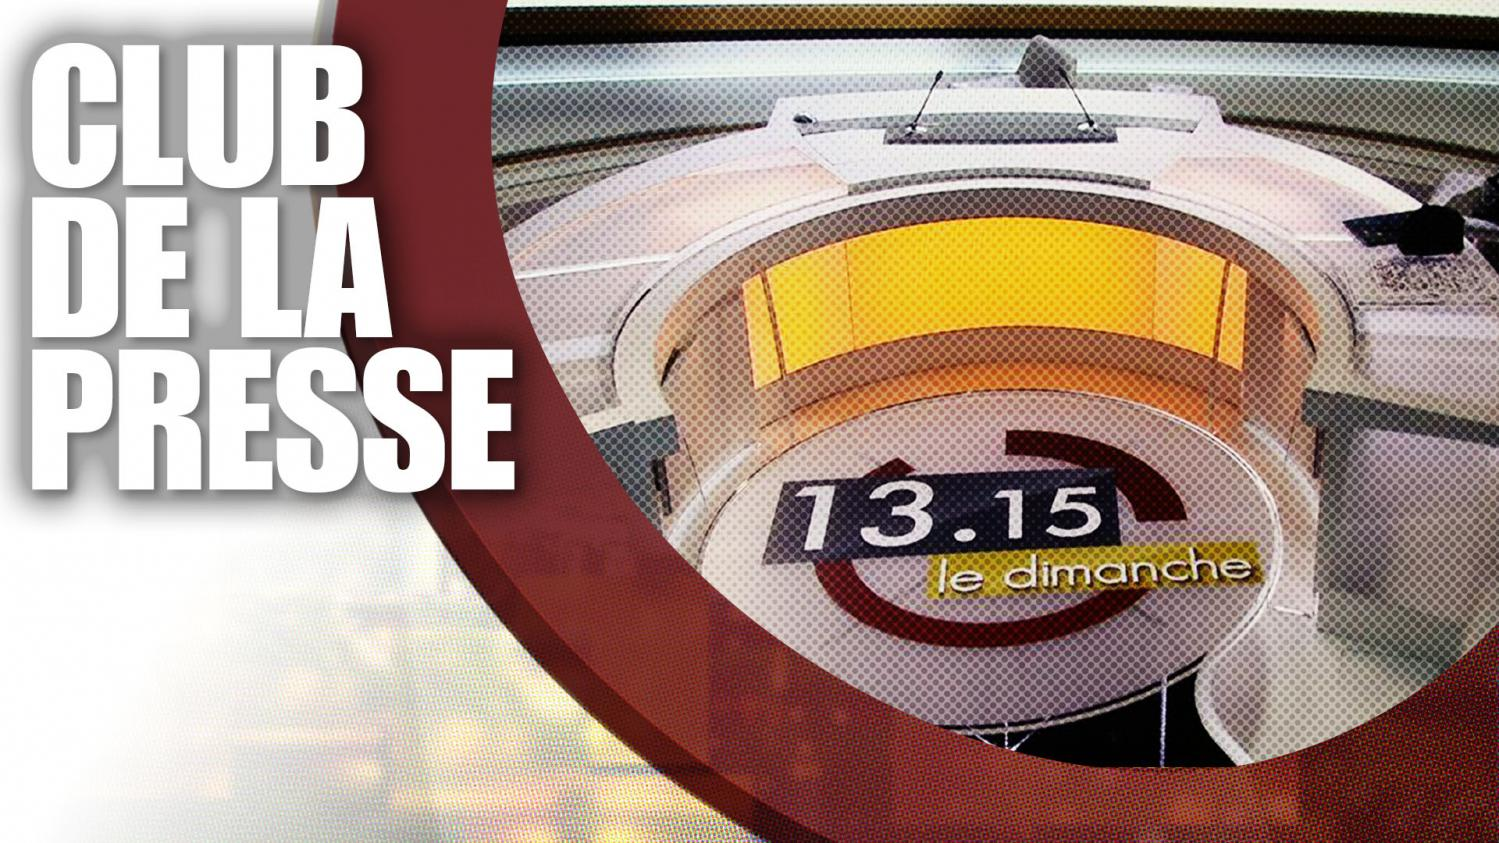 13h15 le dimanche club de la presse france 2 5 mars 2017 en replay. Black Bedroom Furniture Sets. Home Design Ideas